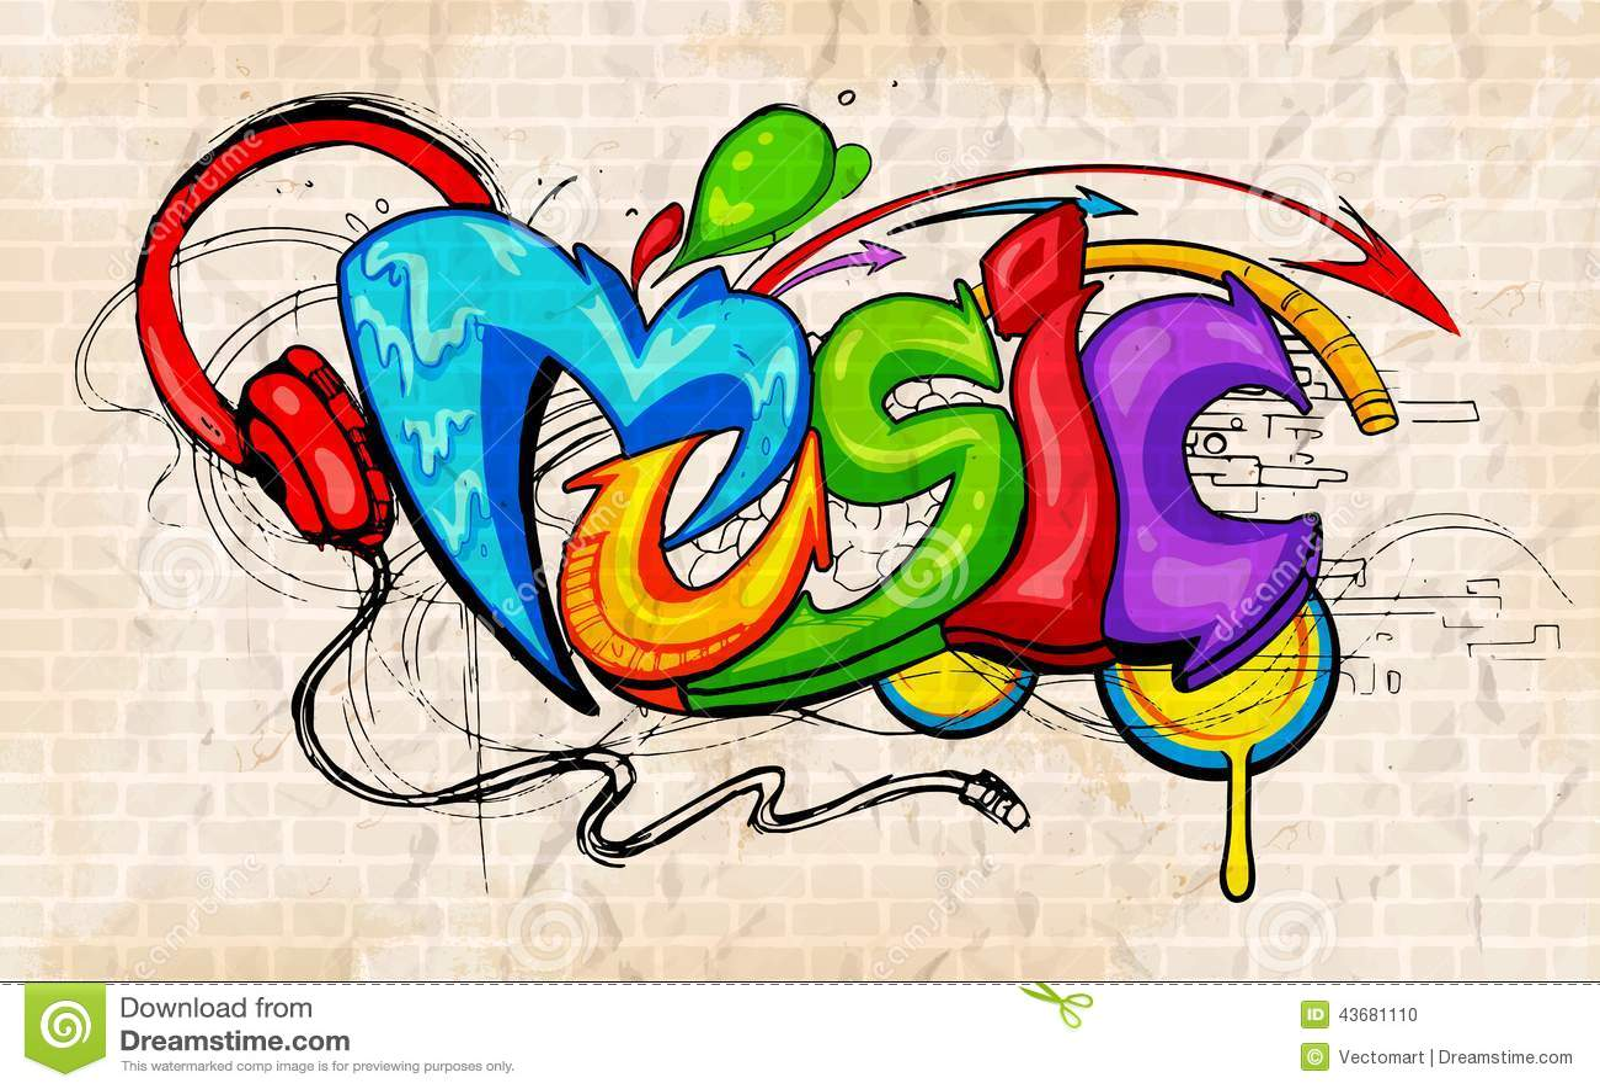 fondo-di-musica-di-stile-dei-graffiti-43681110.jpg